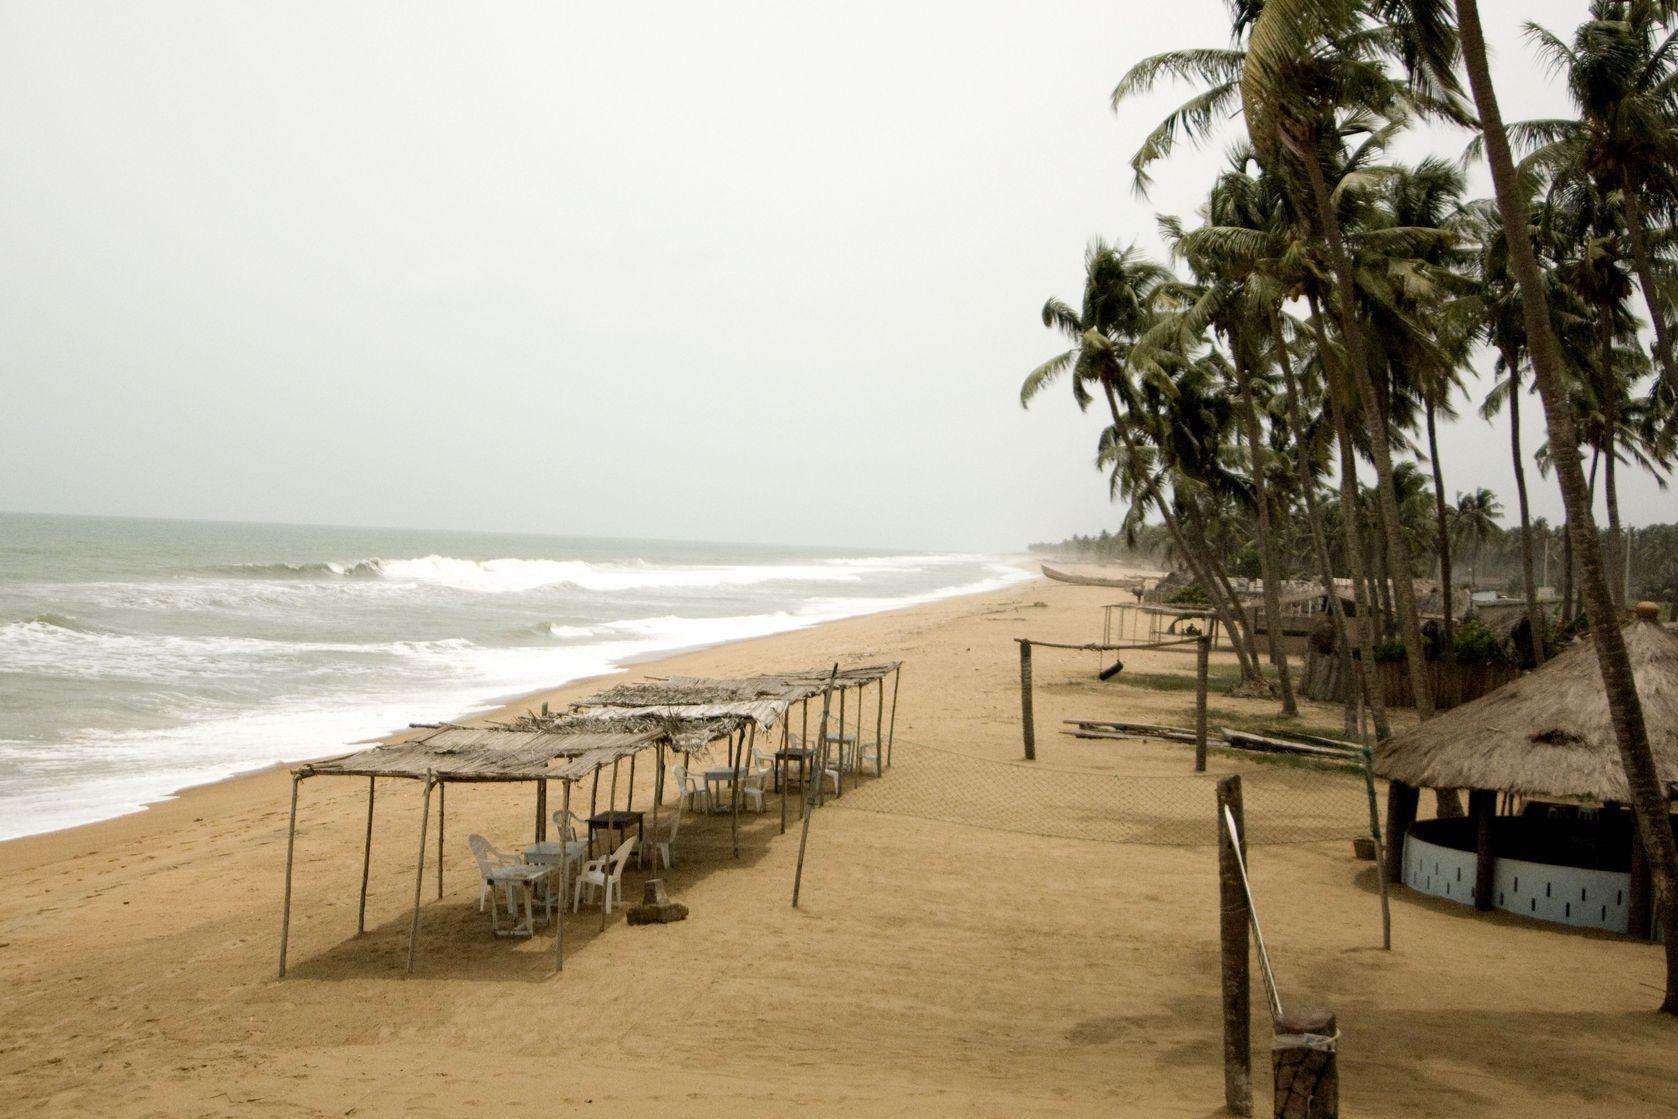 Pláž v Beninu   isselee/123RF.com